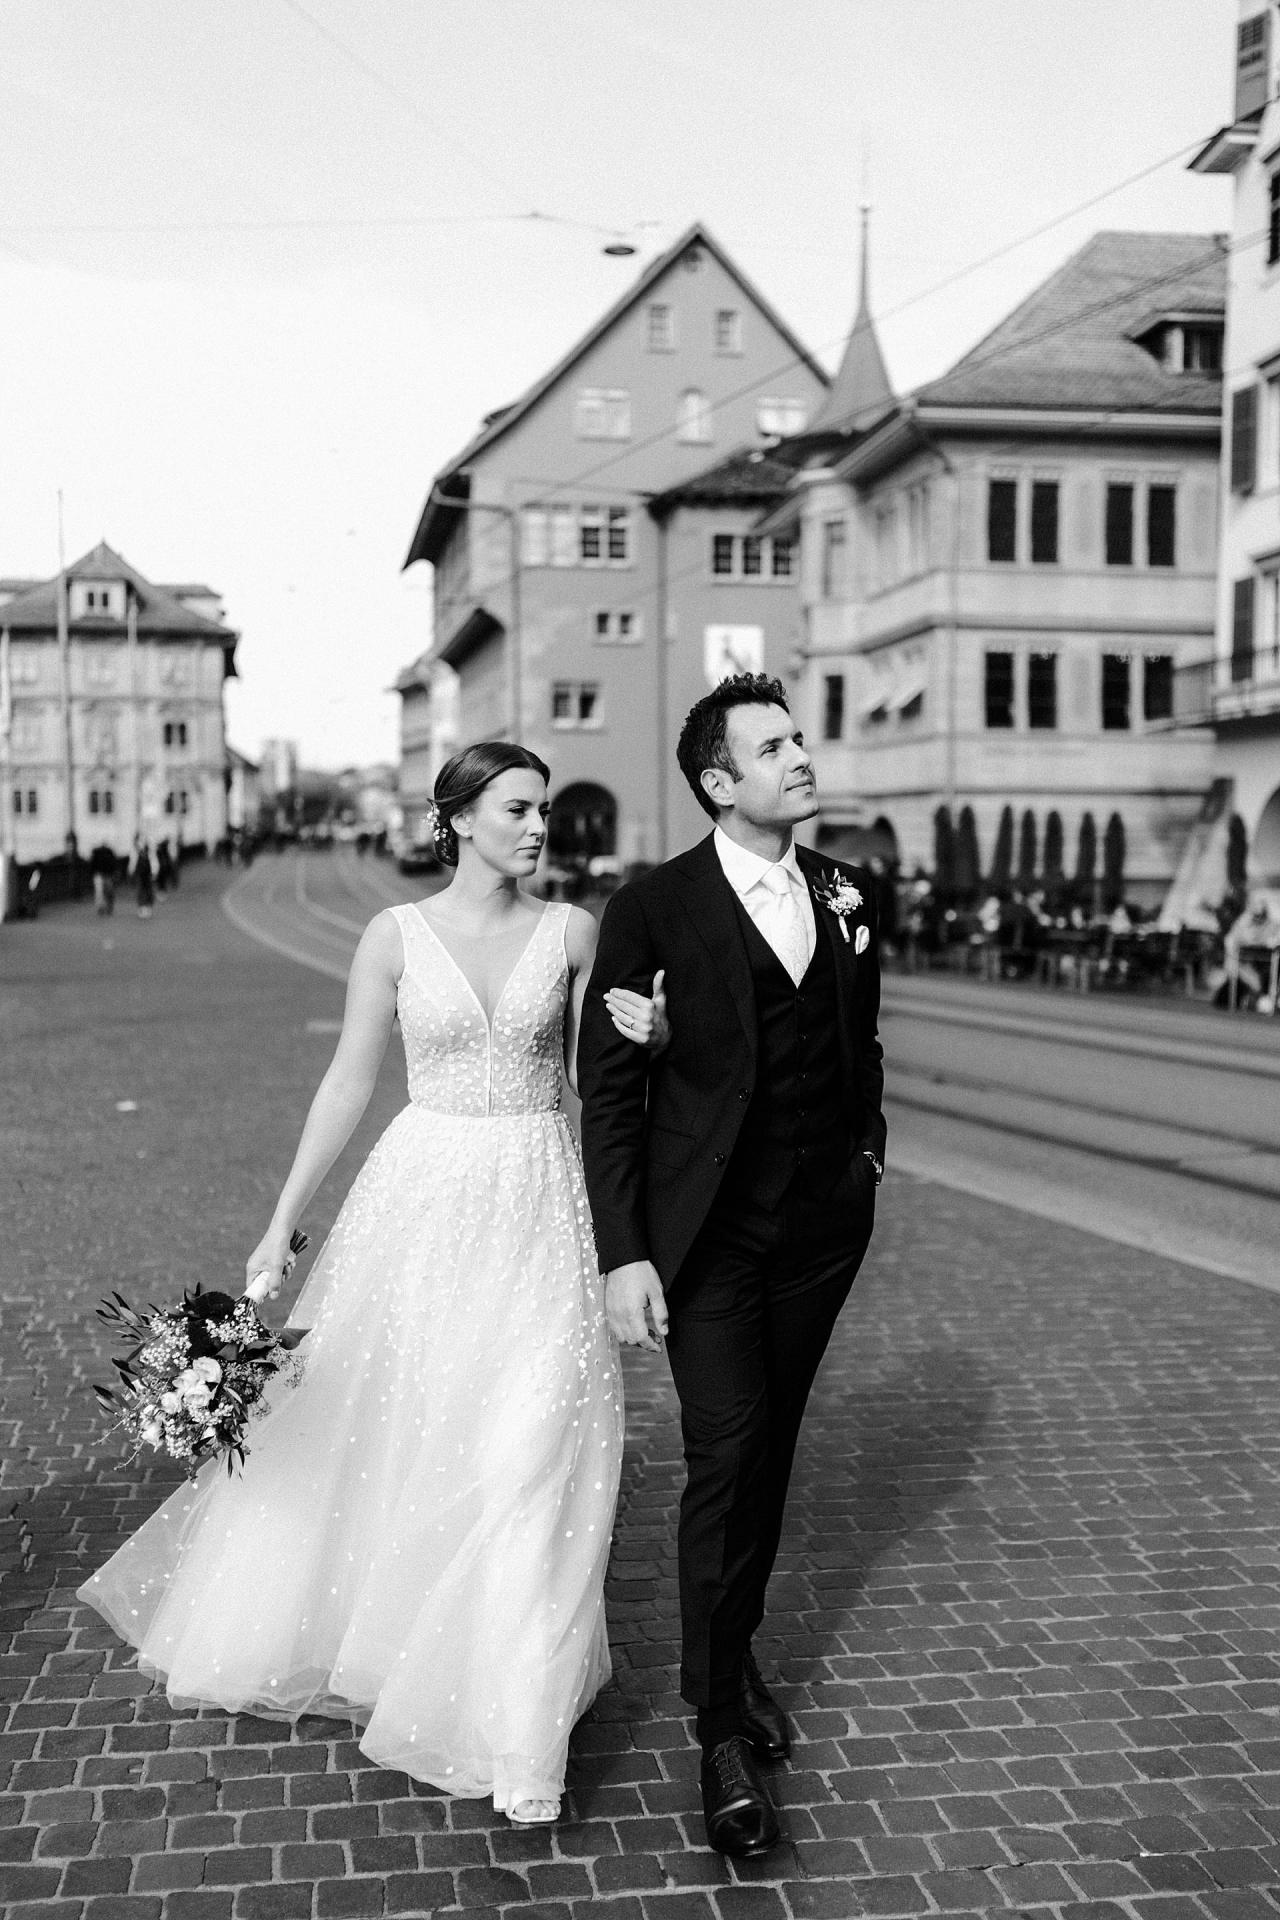 Zurich Elopement Photographer | The couple has a nice walk through the city